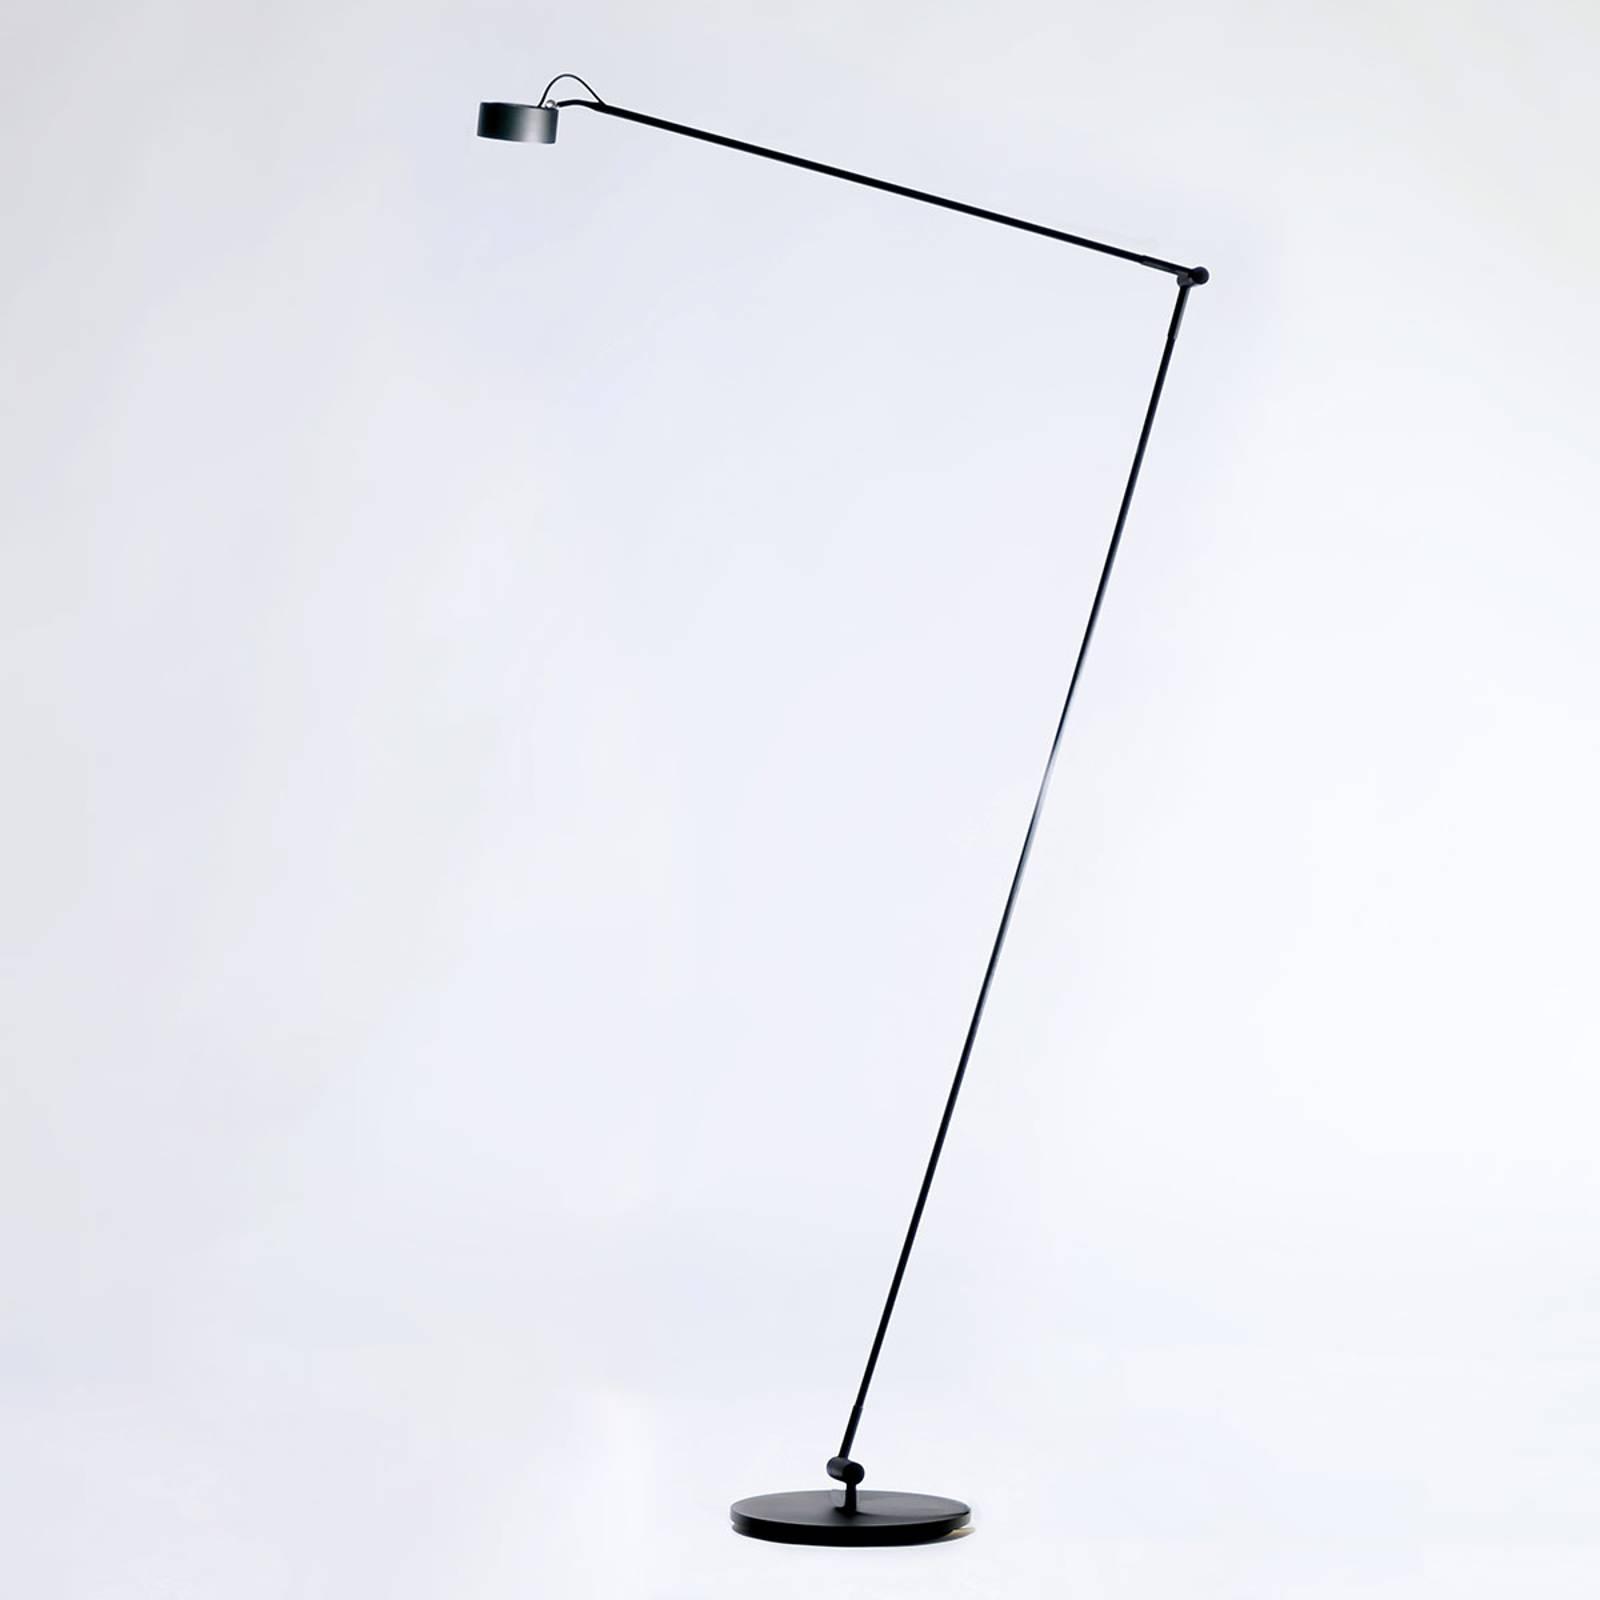 Vloerlamp Radius Absolut Basica Knik Zwart Soft Touch Dim